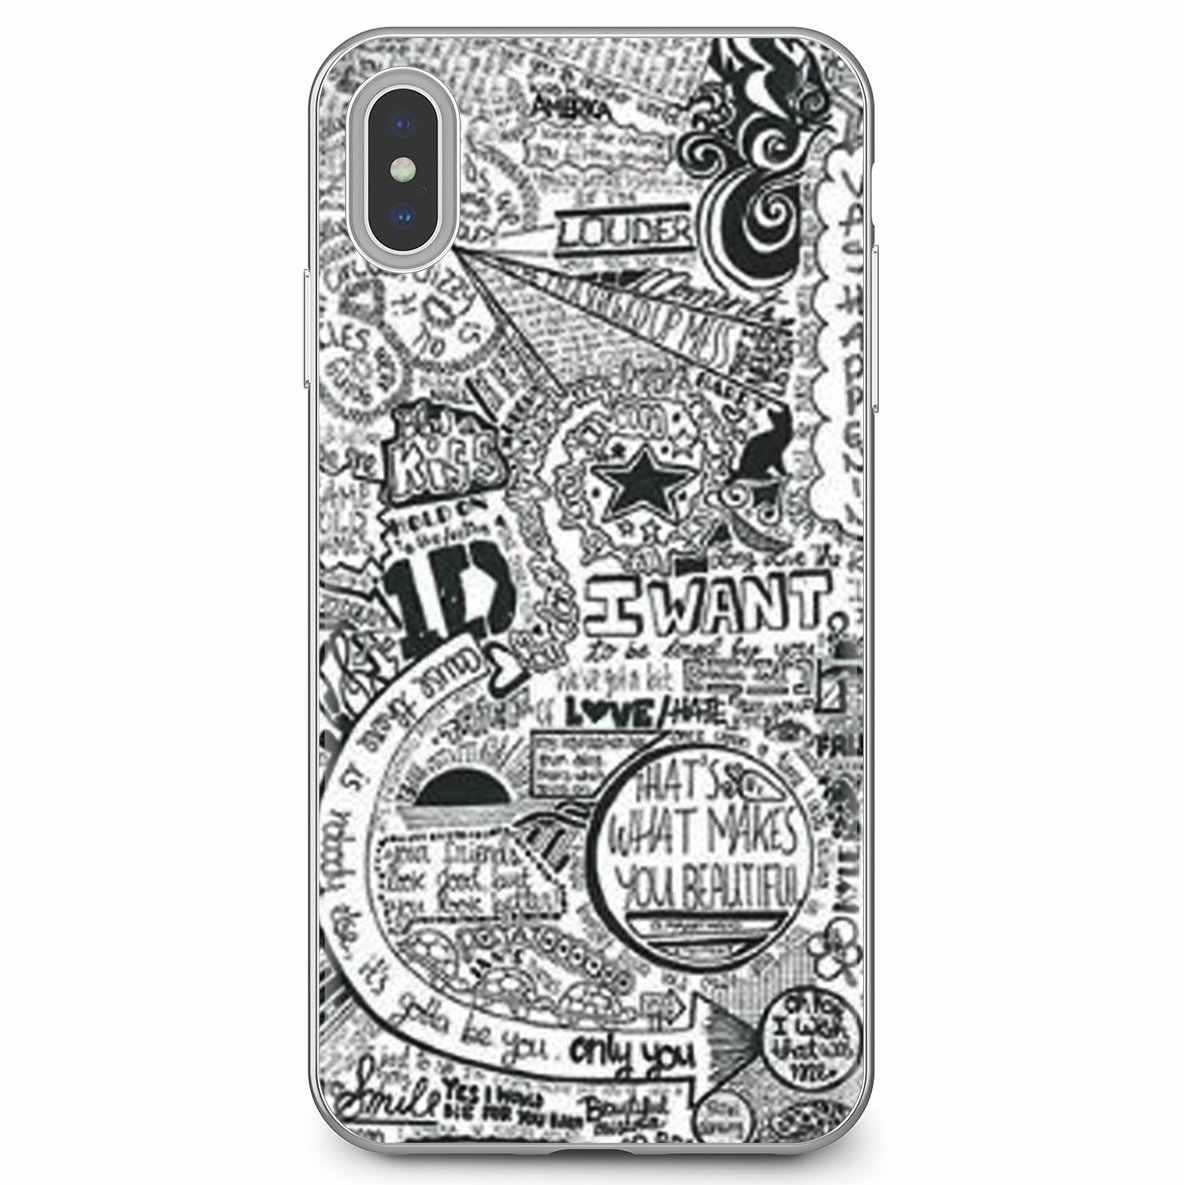 Für Huawei G7 G8 P7 P8 P9 P10 P20 P30 Lite Mini Pro P Smart 2017 2018 2019 Weiche Abdeckung EINE RICHTUNG 1D Niall horan-shirt-männer Harry Louis